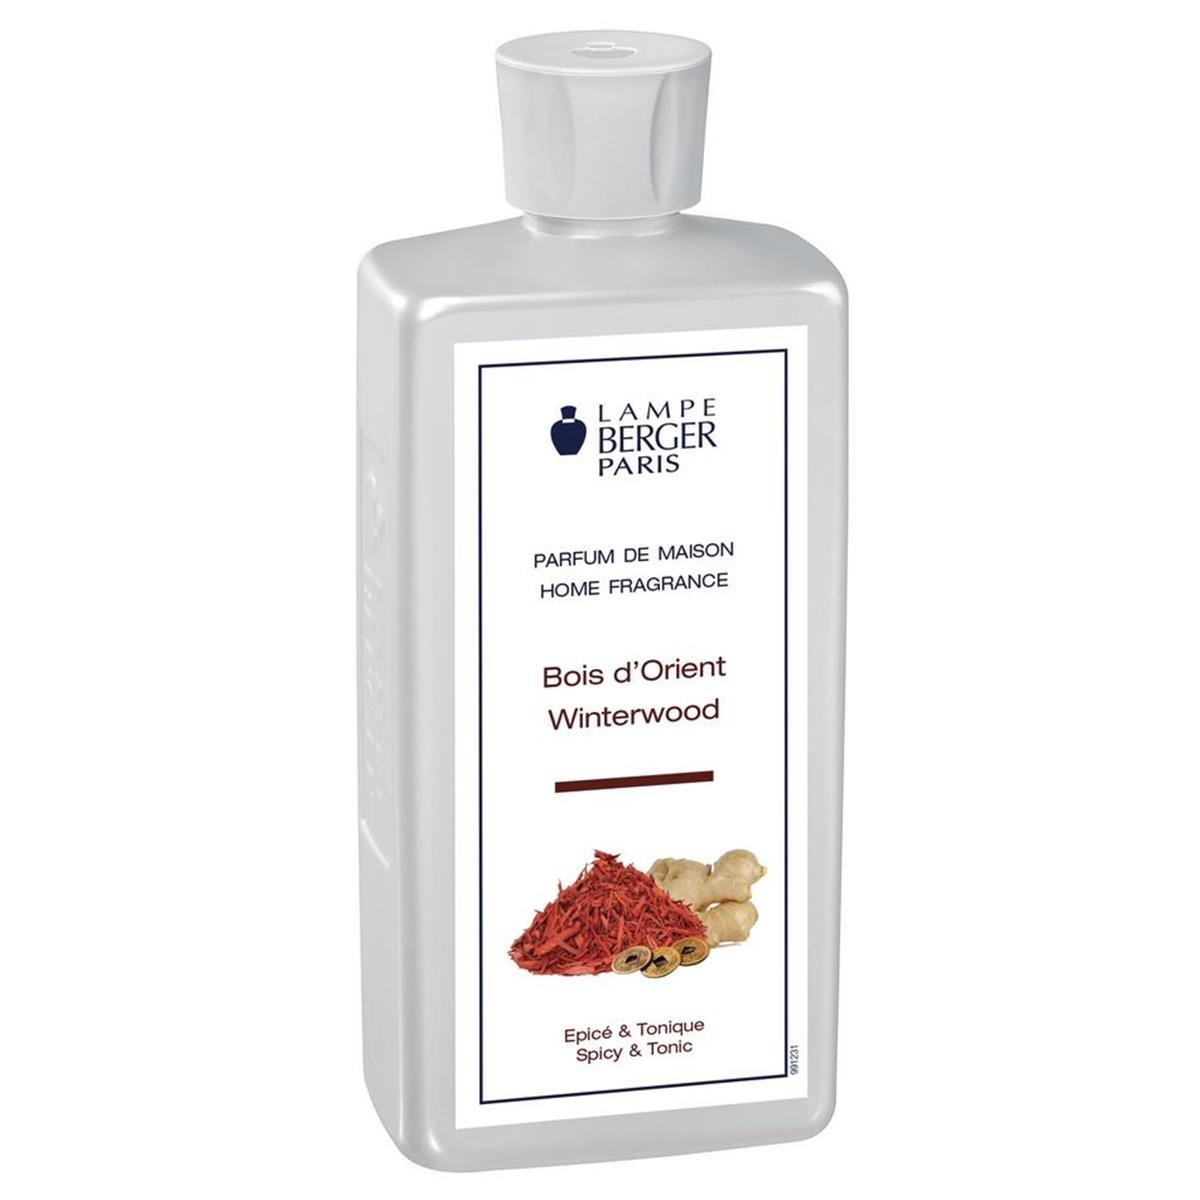 Lampe Berger - Profumo per ambienti, aroma: Legno d'oriente, 500 ml [Classe di efficienza energetica A+++] aroma: Legno d' oriente 115036 B001TE6U8C